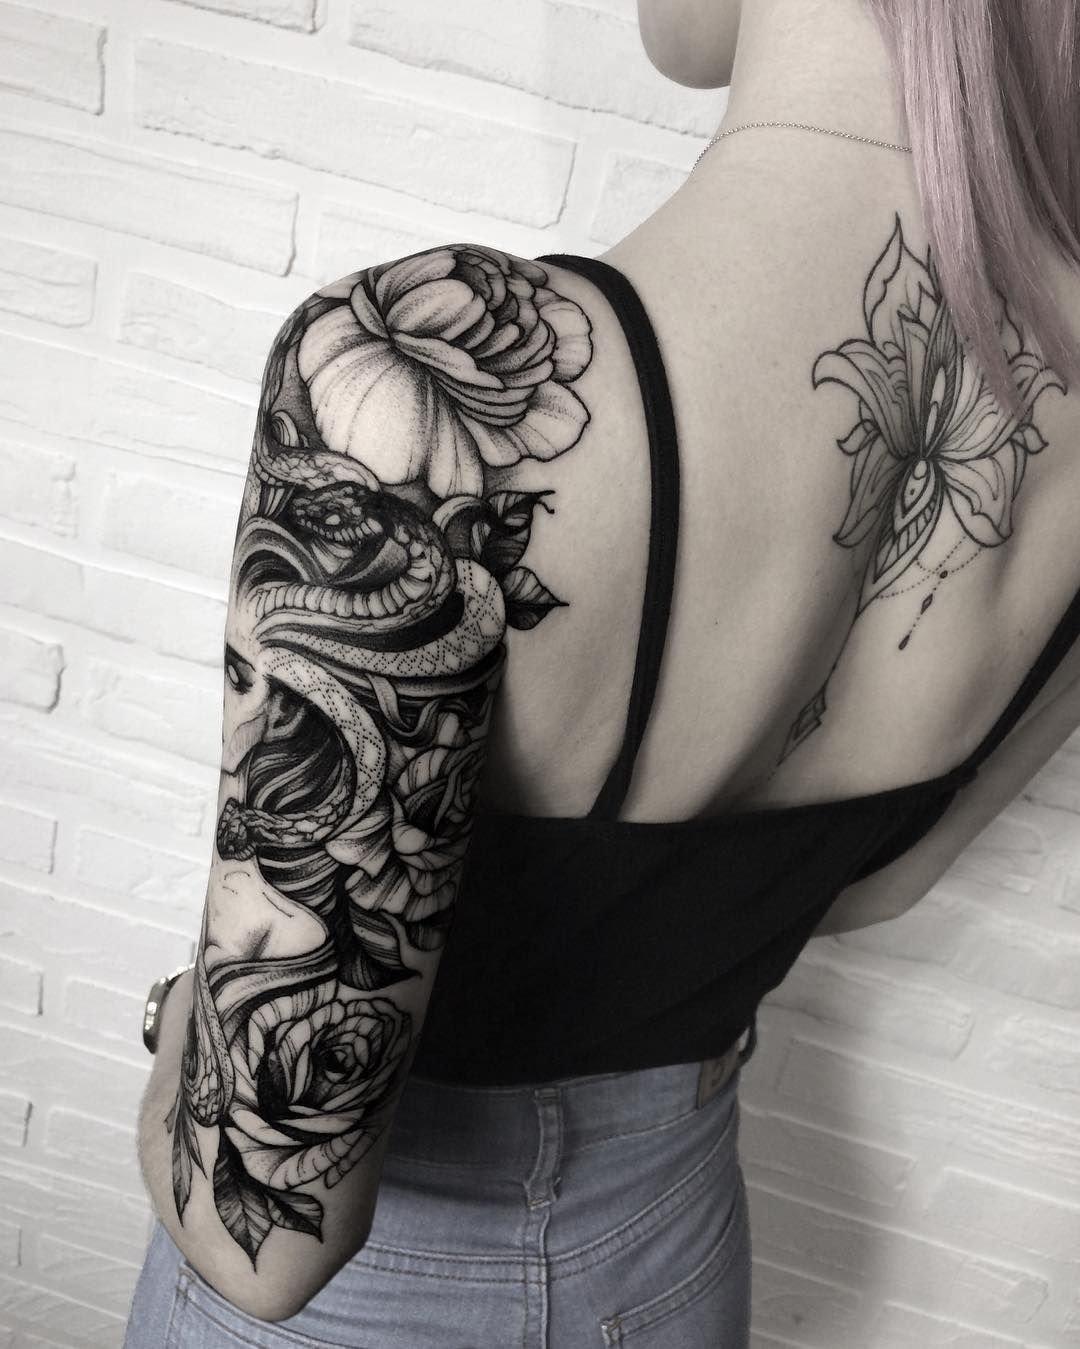 snake woman sleeve tattoo idea | snake tattoos | pinterest | woman